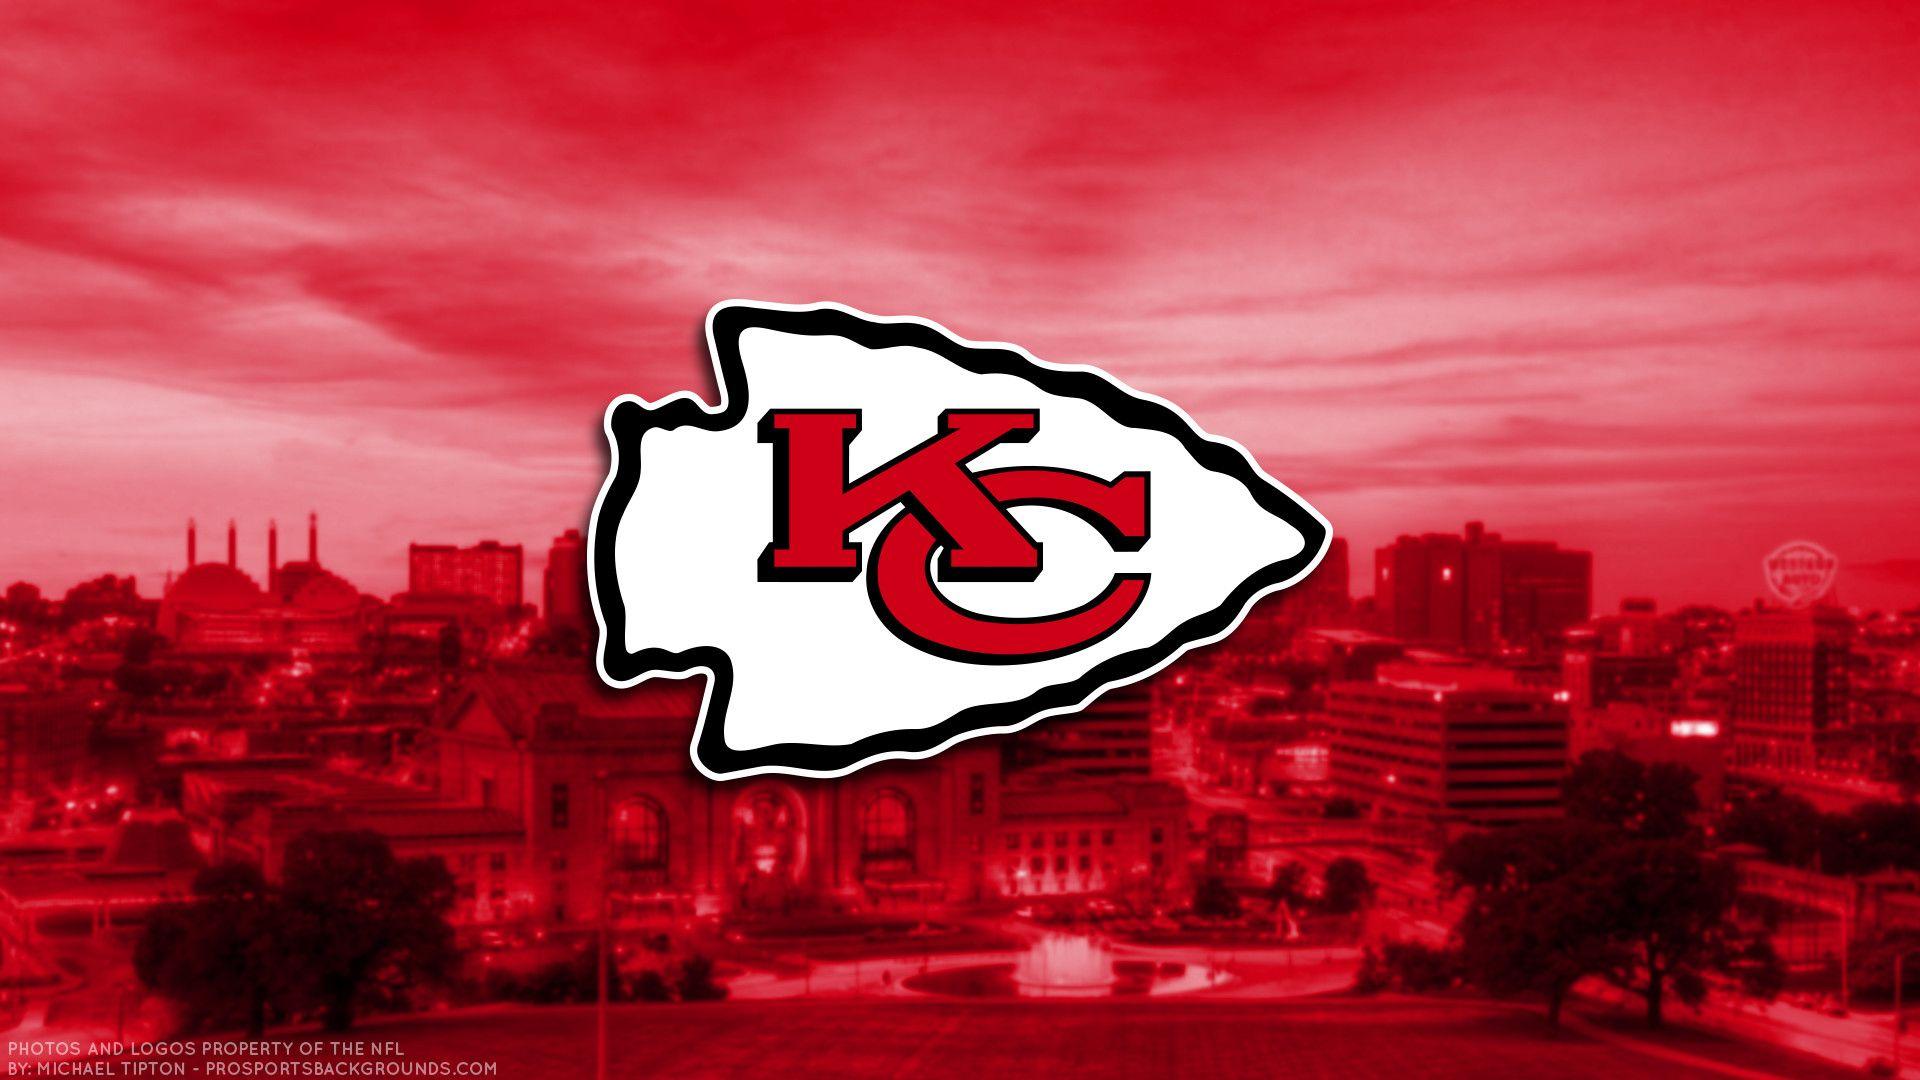 Kansas City Chiefs 2017 football logo wallpaper pc desktop